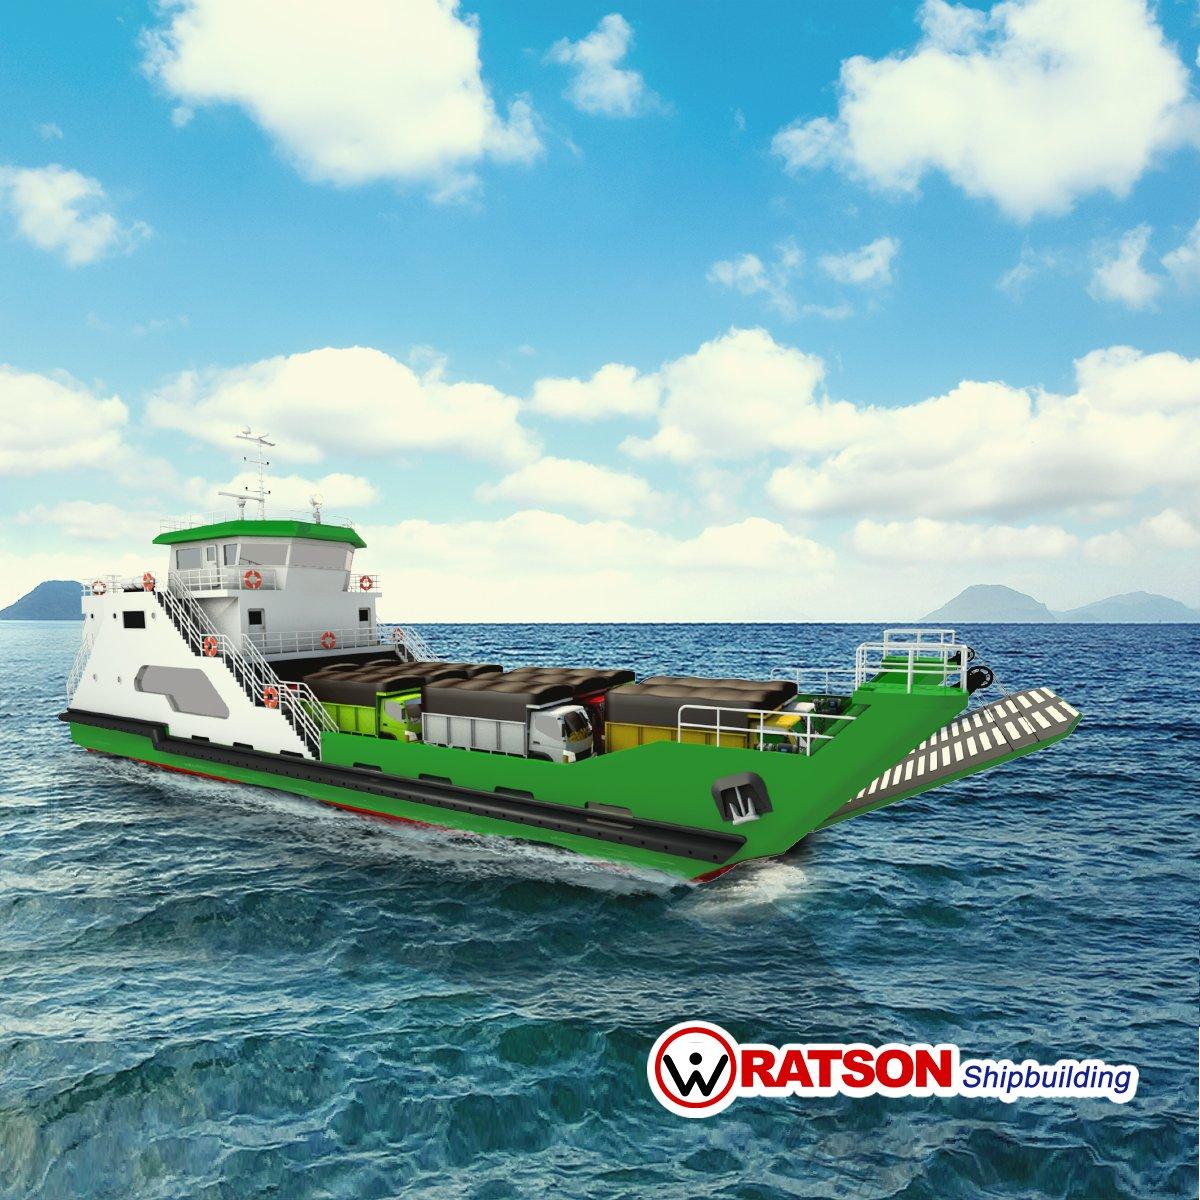 PT  Ratson Maritim Indonesia on Twitter: